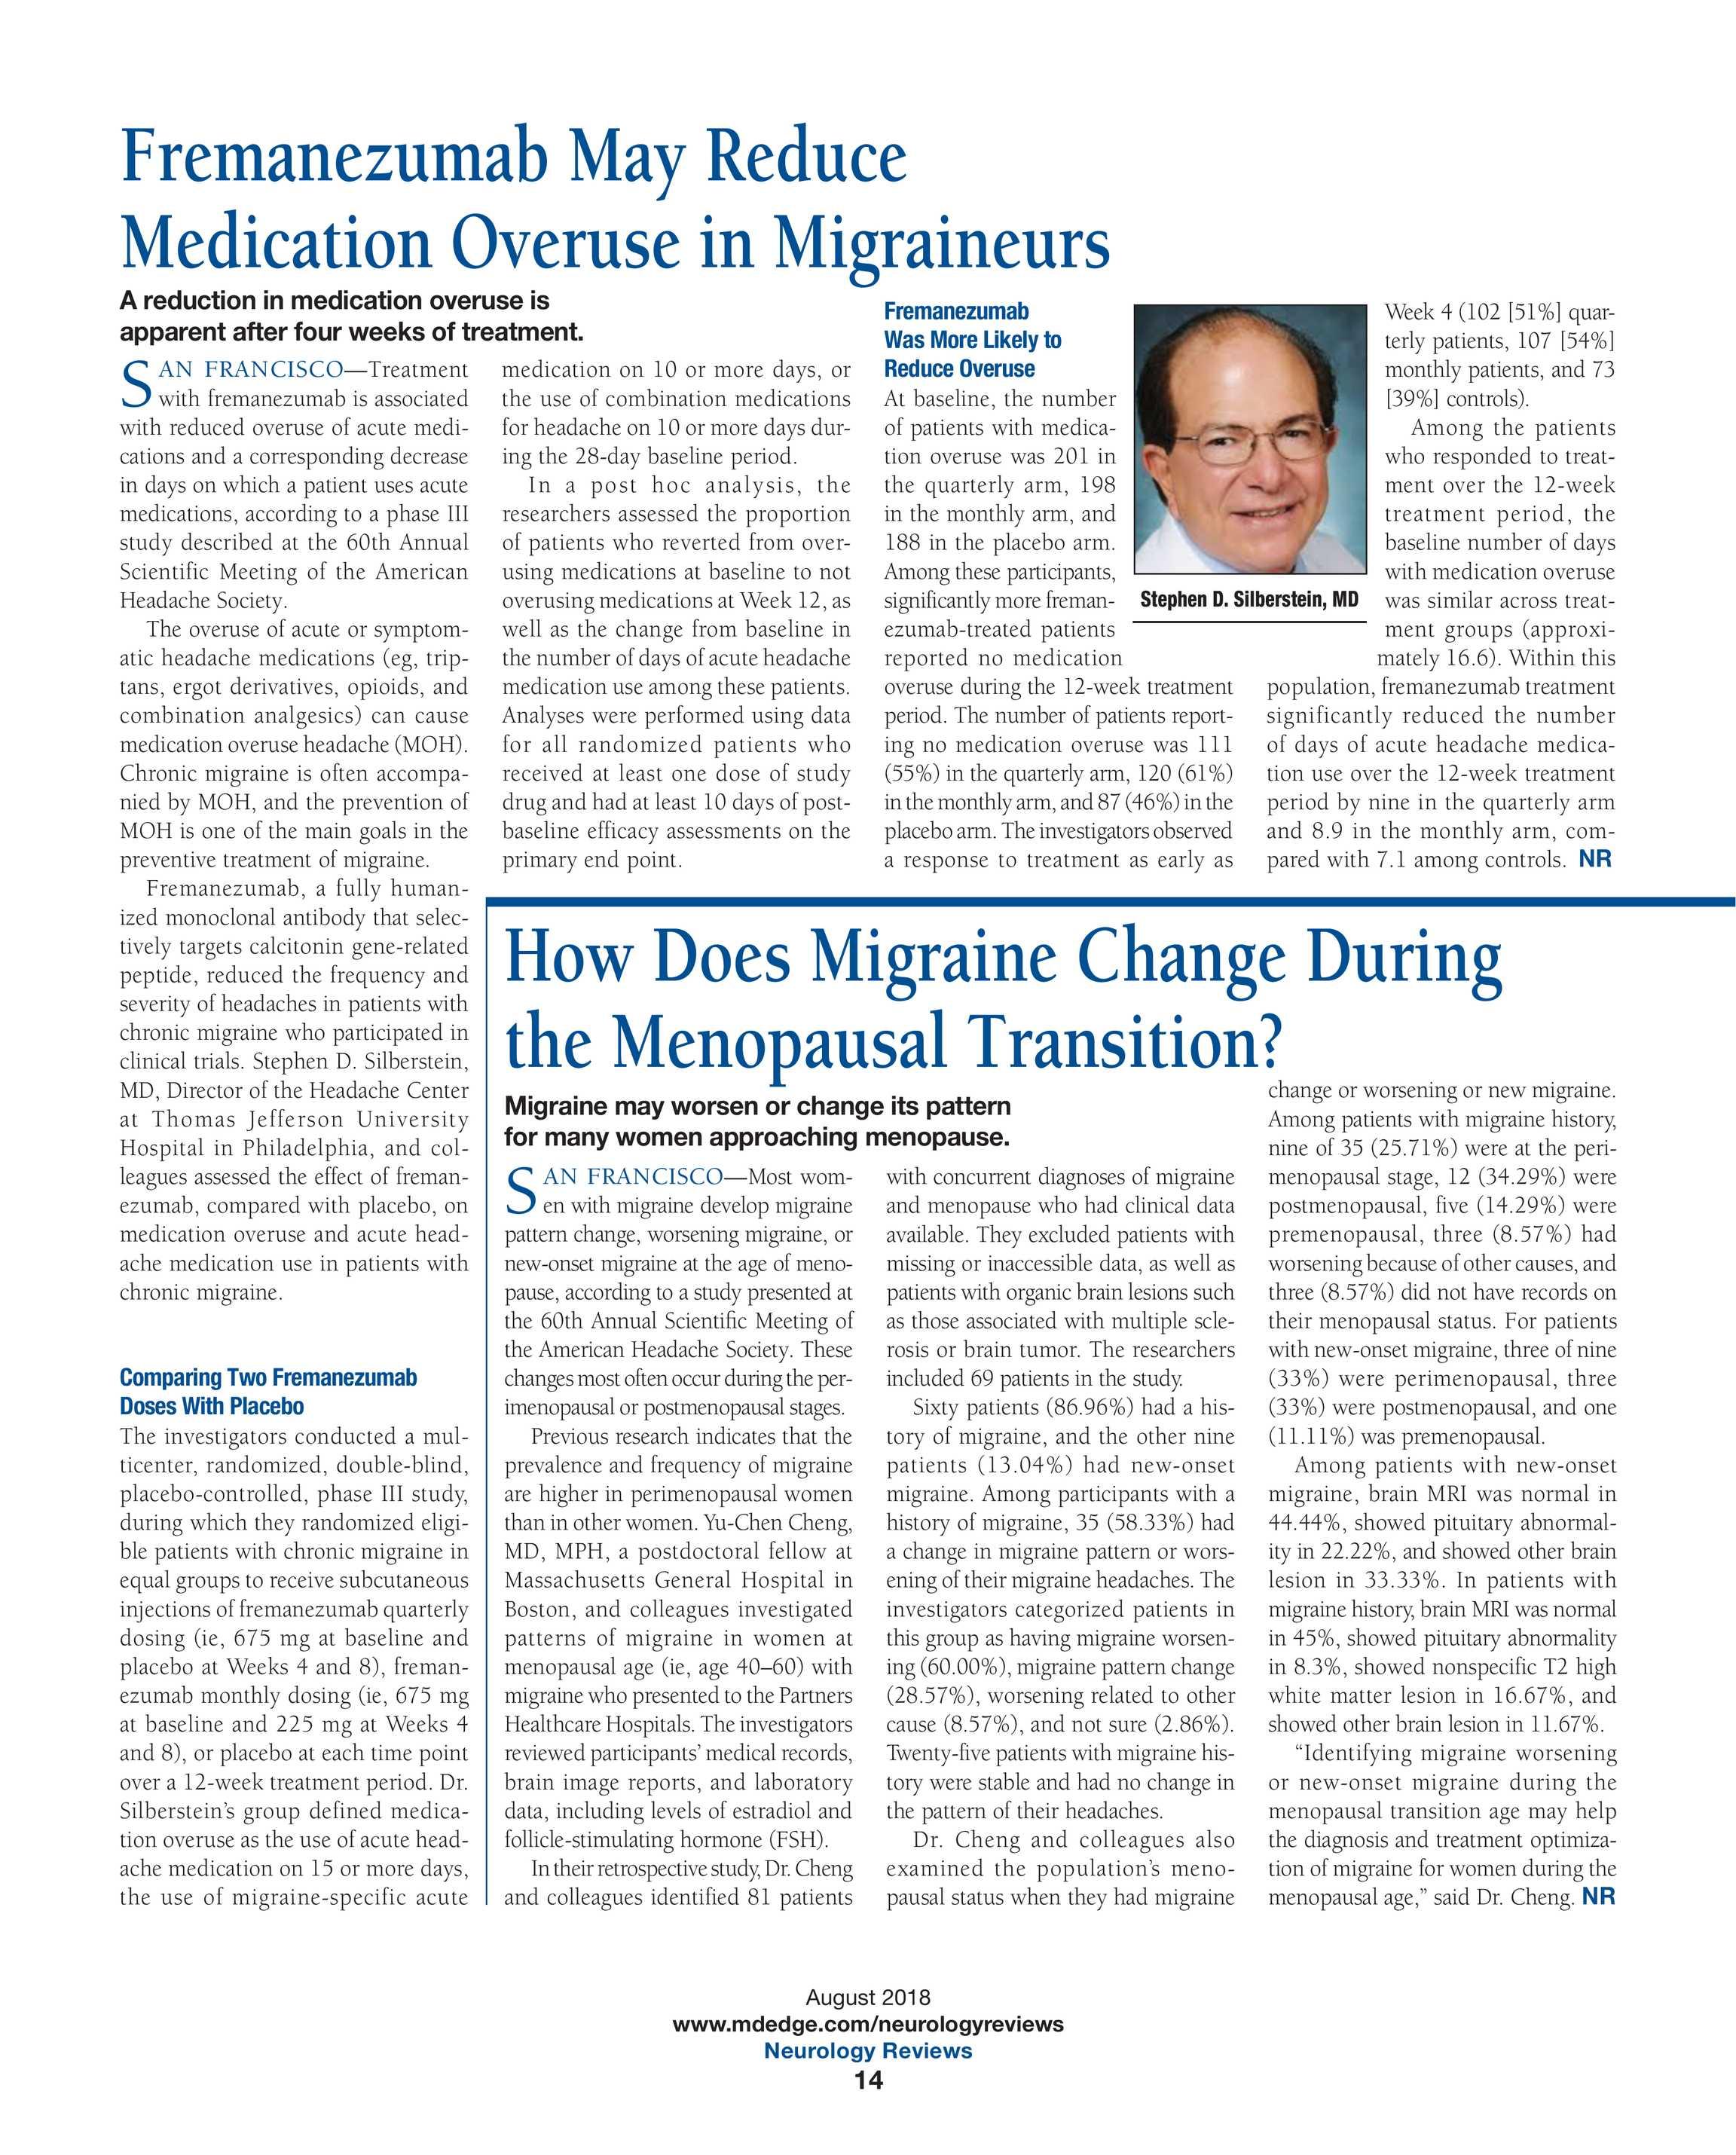 Neurology Reviews - NR Aug 2018 - page 15